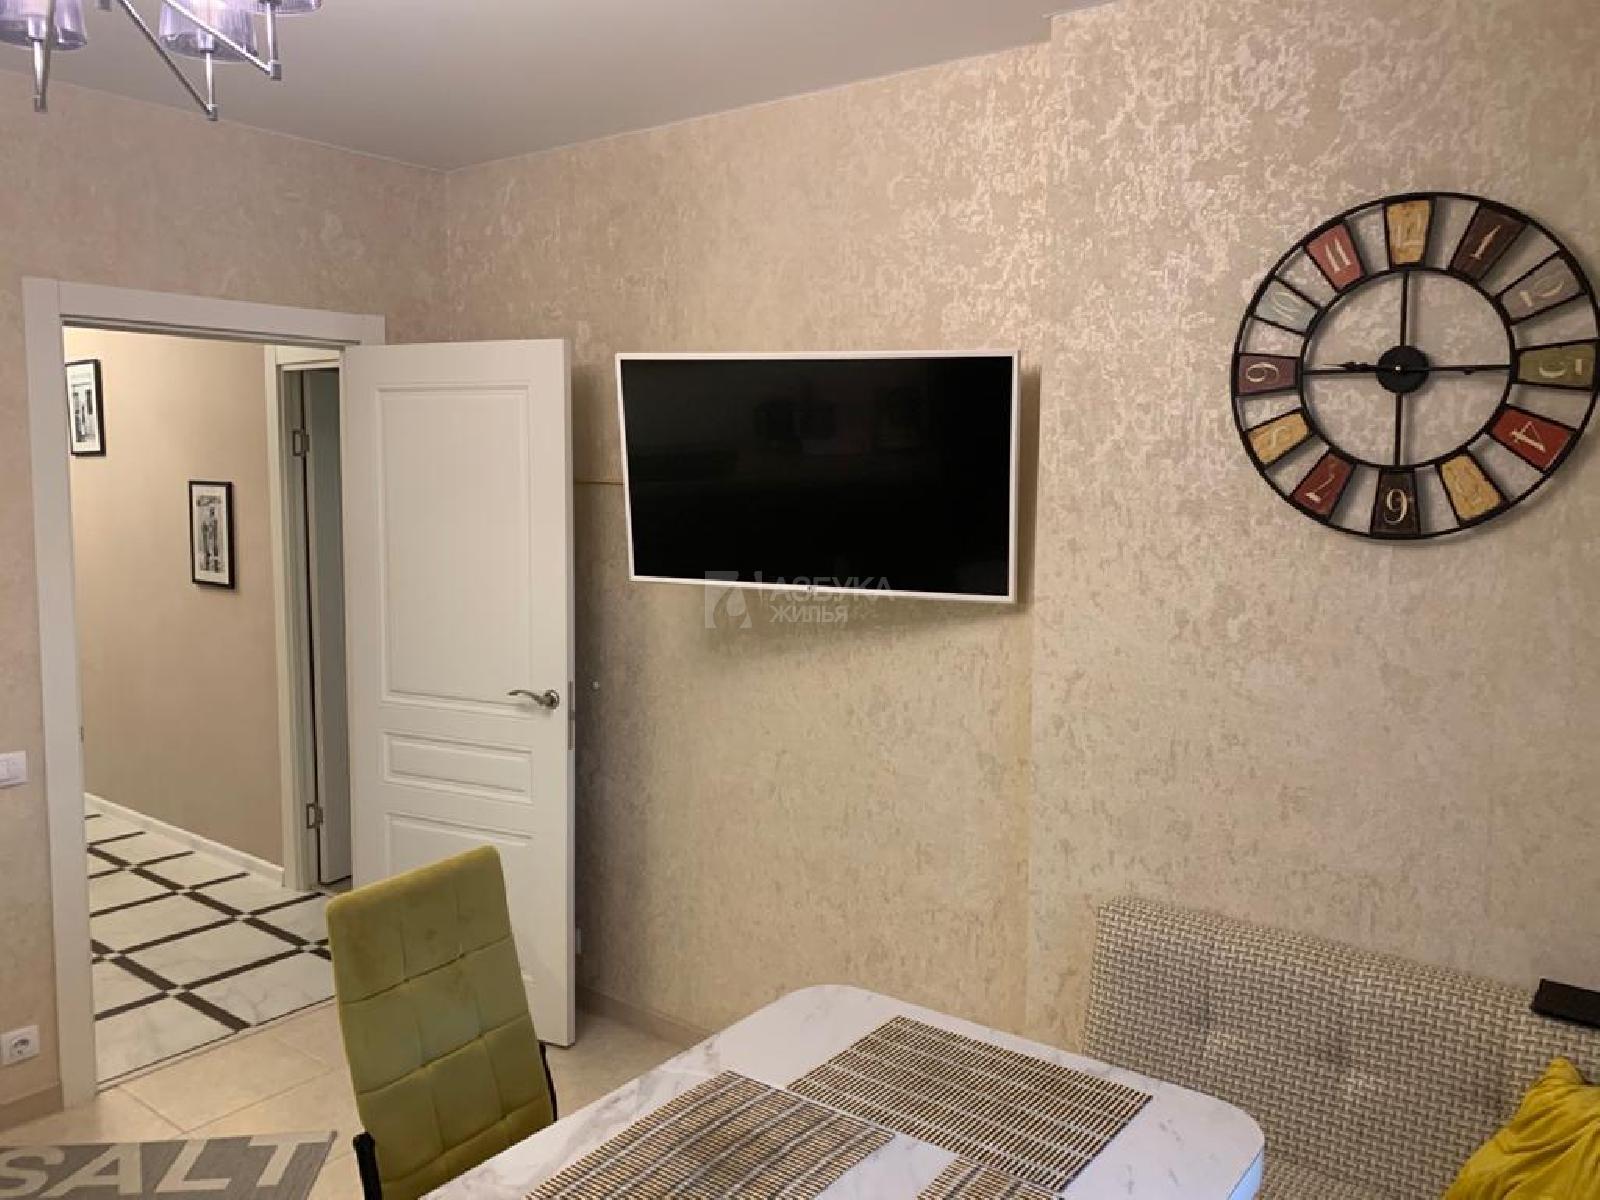 Фото №5 - 3-комнатная квартира, Москва, Поляны улица 5, метро Улица Скобелевская